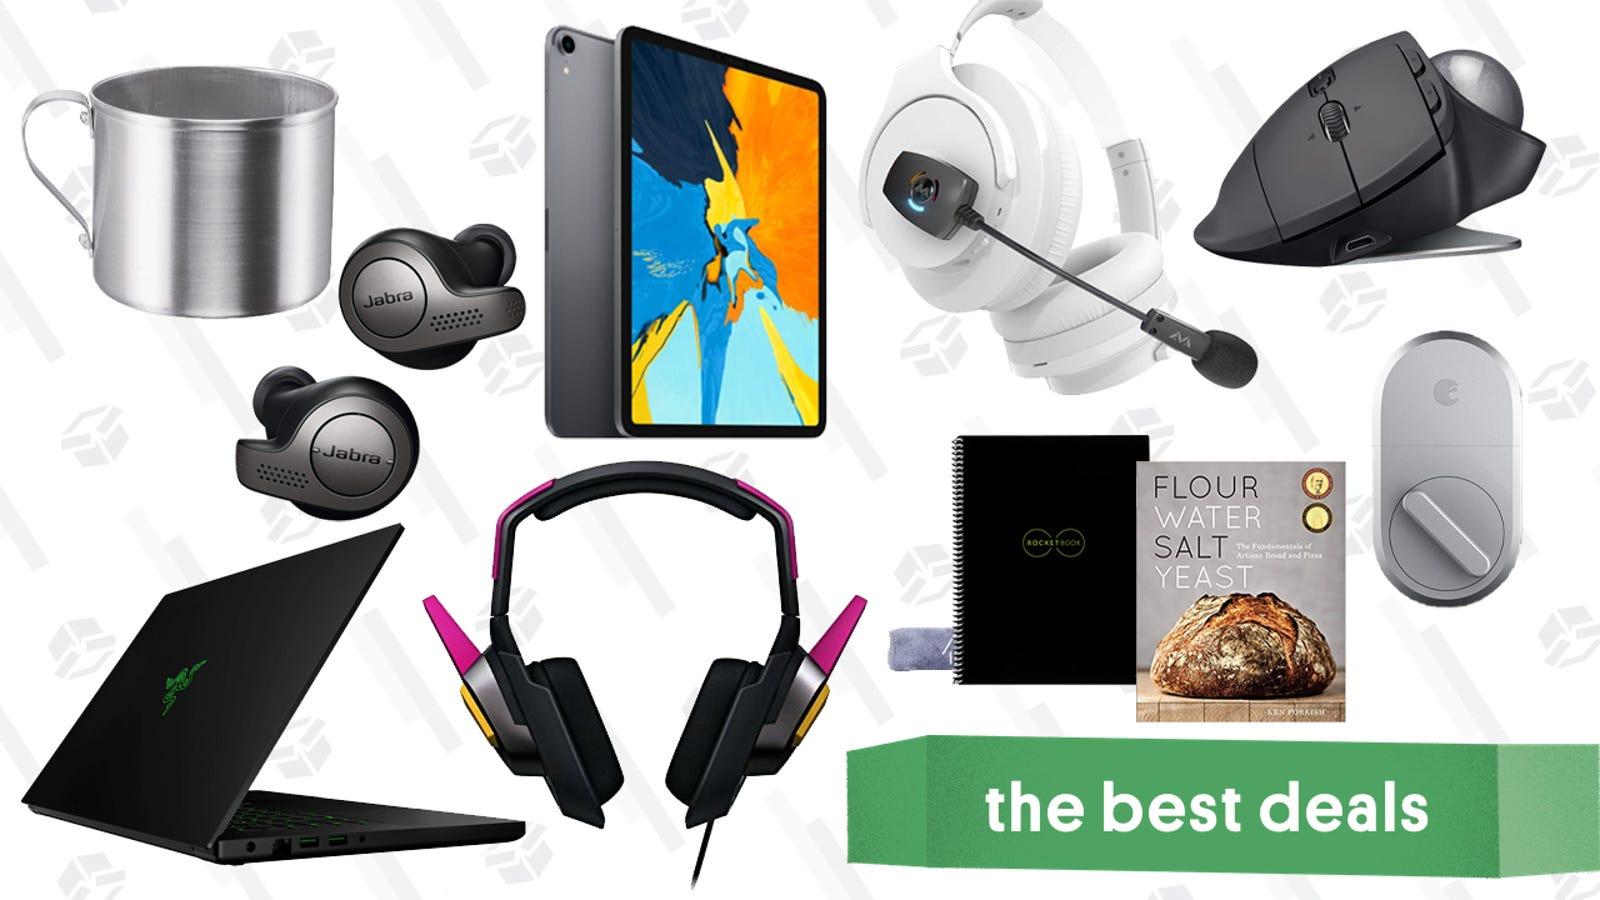 Monday's Best Deals: Wayfair Labor Day Clearance, Razer Sale, Jabra Headphones, and More